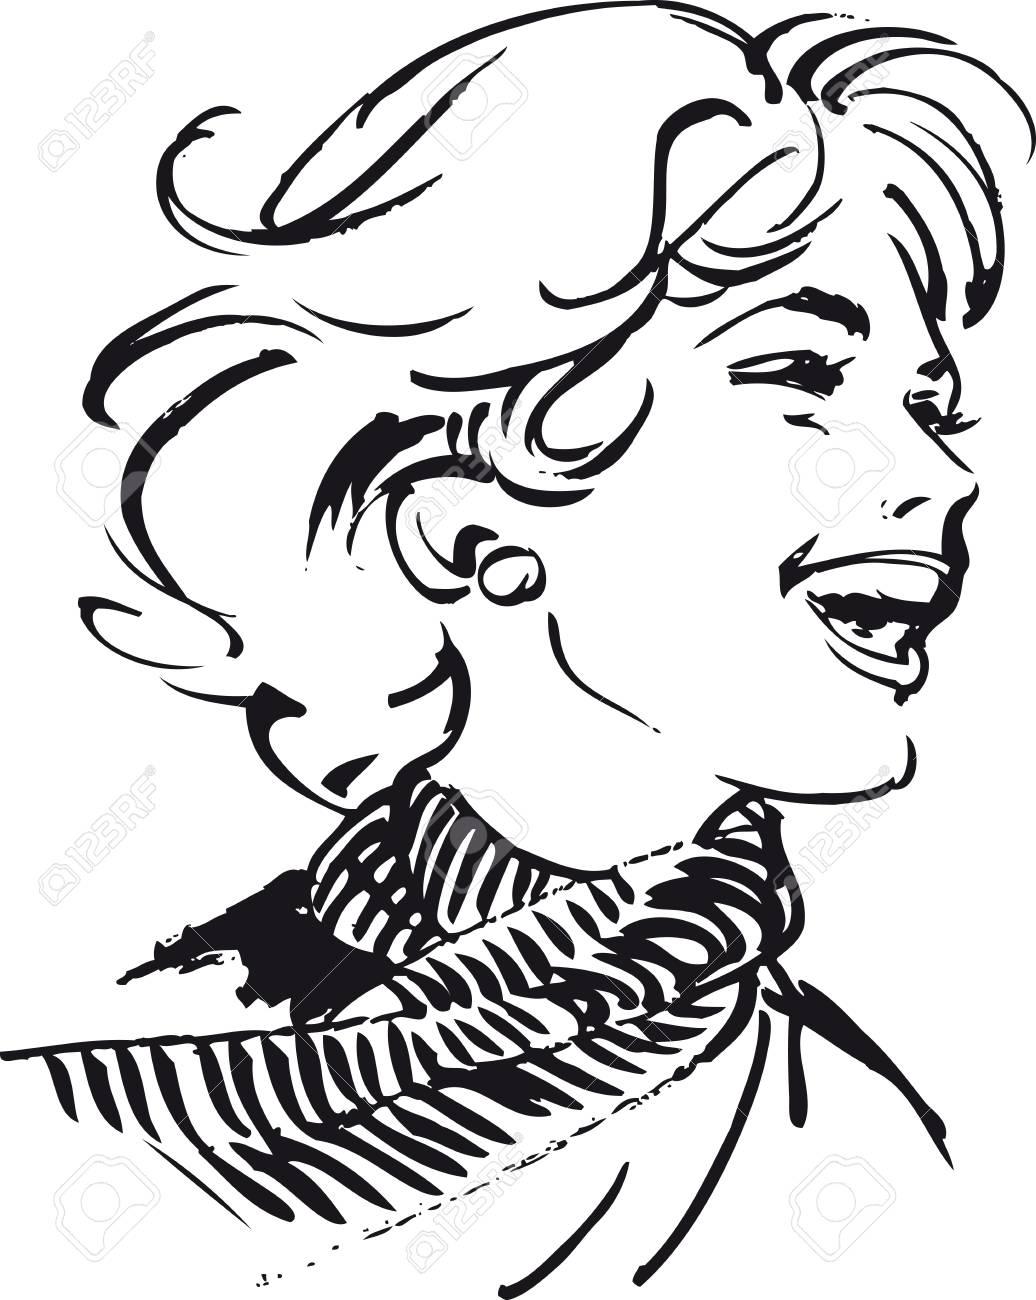 Laughing schoolgirl clipart. Free download transparent .PNG | Creazilla